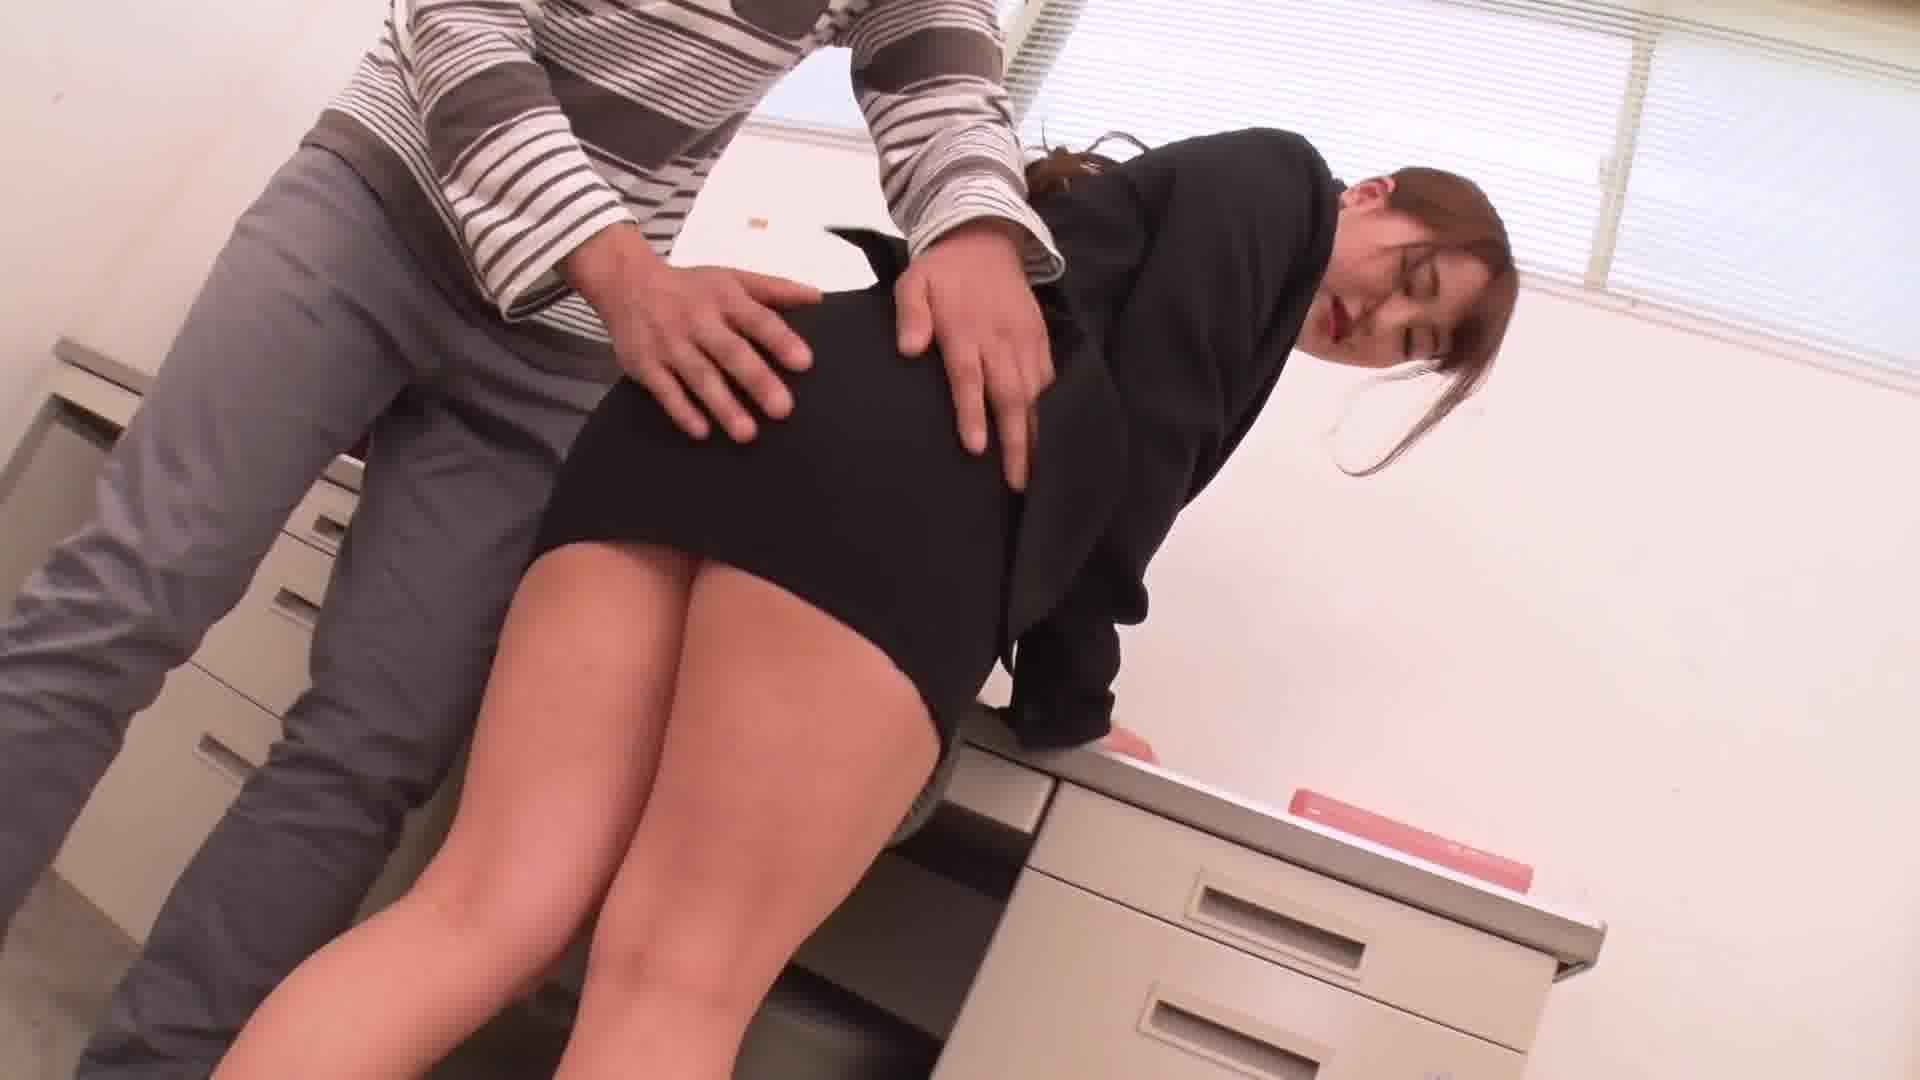 THE 未公開 〜尻コキ・尻コキ・尻コキ〜 - 北条麻妃【OL・手コキ・美乳】